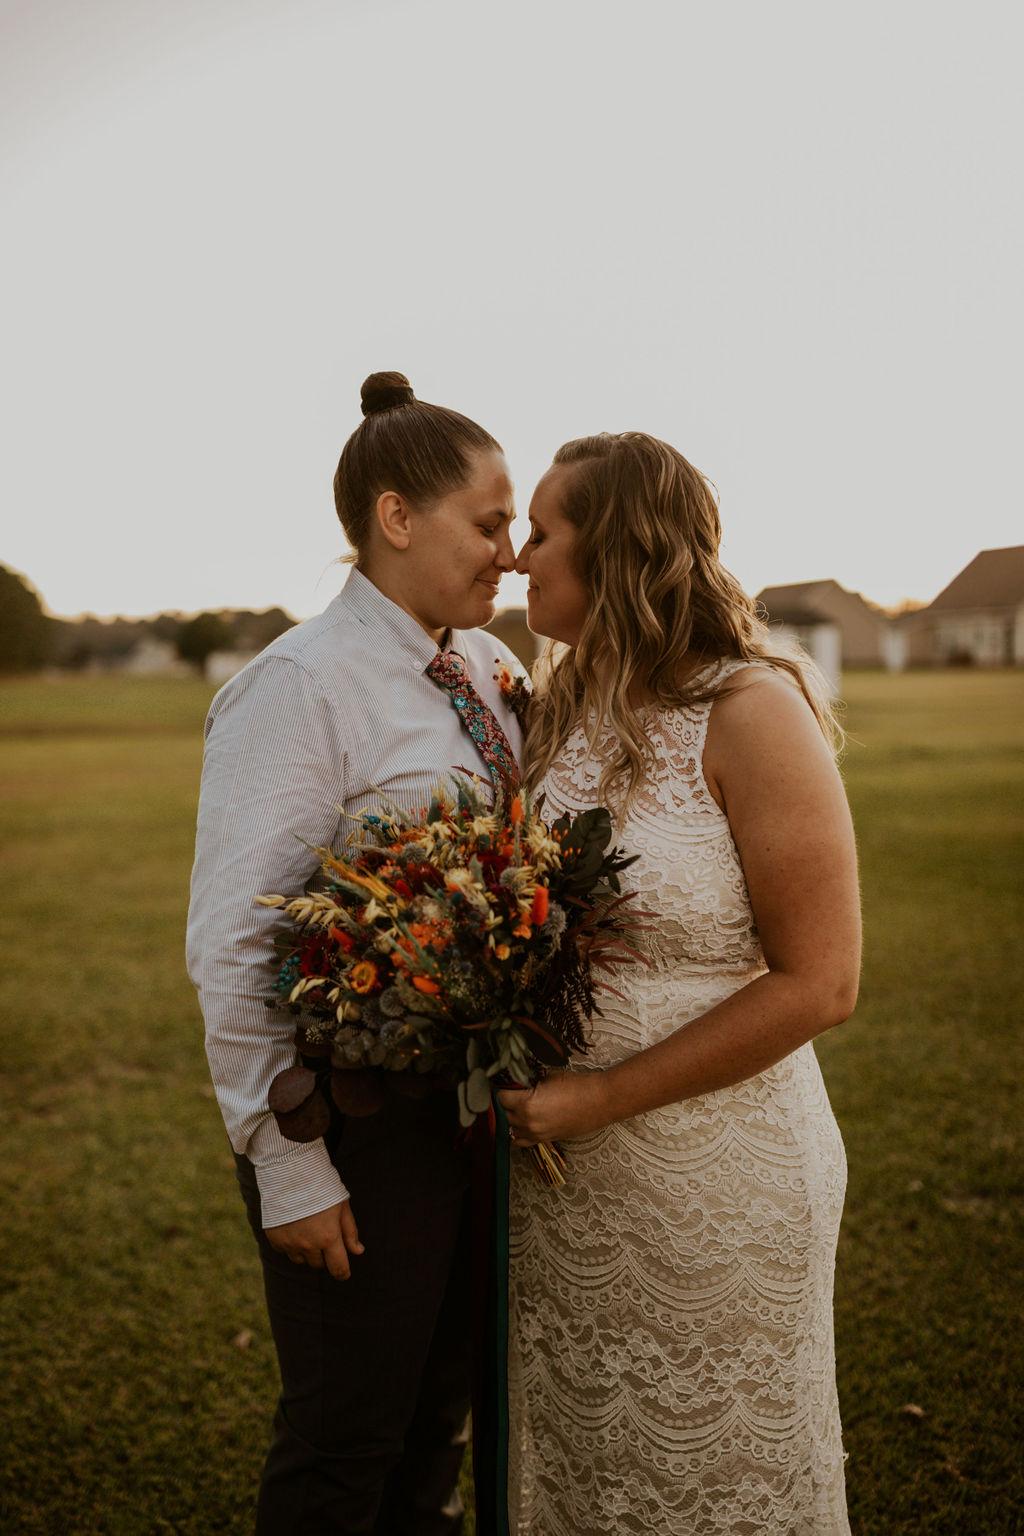 Mady Noel Photo Washington USA same-sex lesbian gay couple wedding photography Dancing With Her magazine